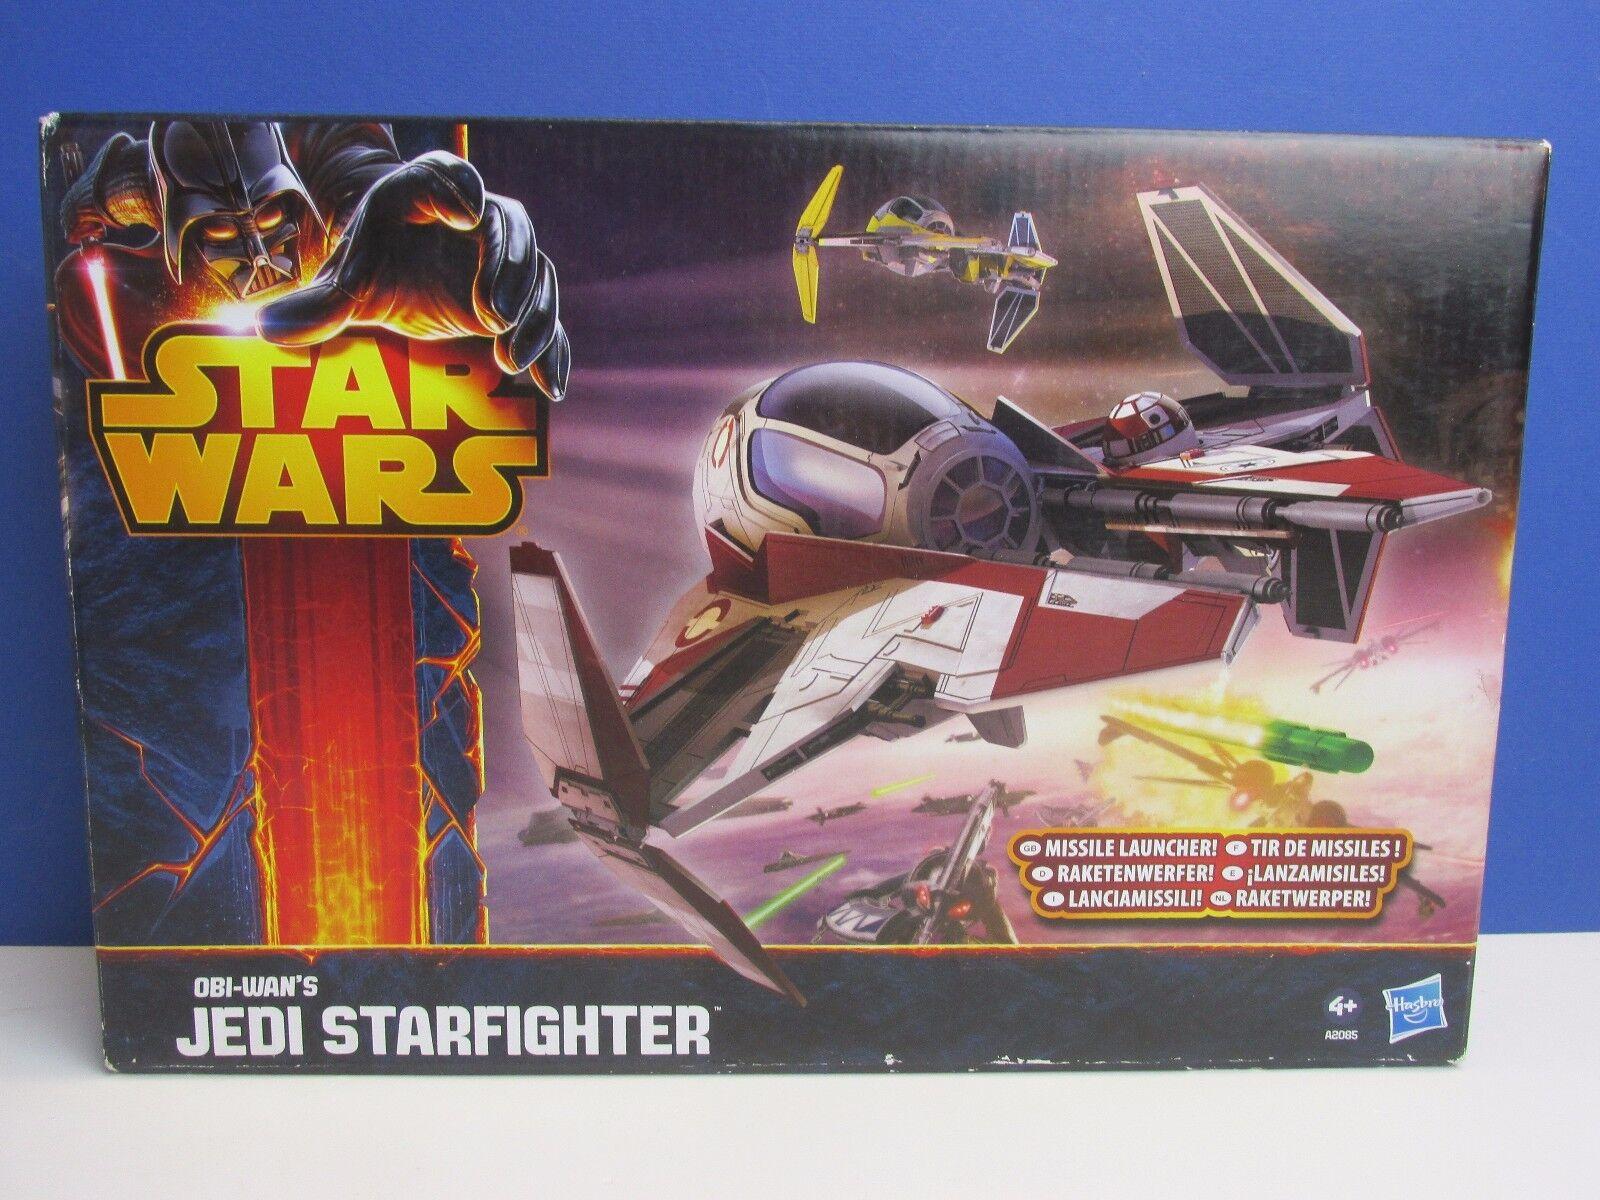 Star wars OBI WAN KENOBI JEDI STARFIGHTER SHIP revenge of sith redS HASBRO 61A